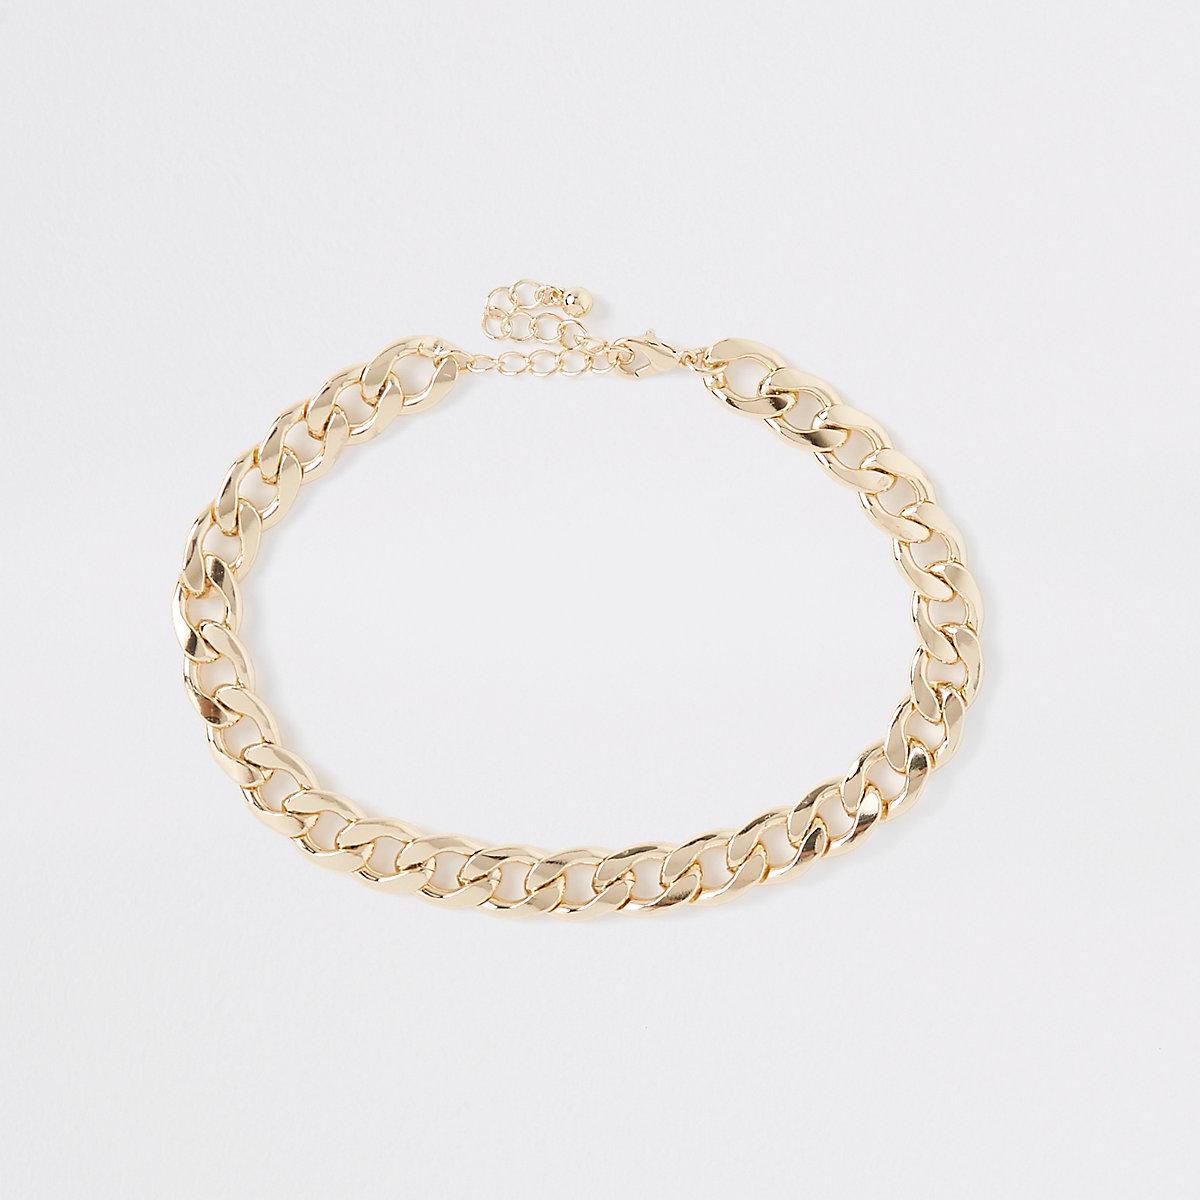 Gold tone chunky curb chain choker